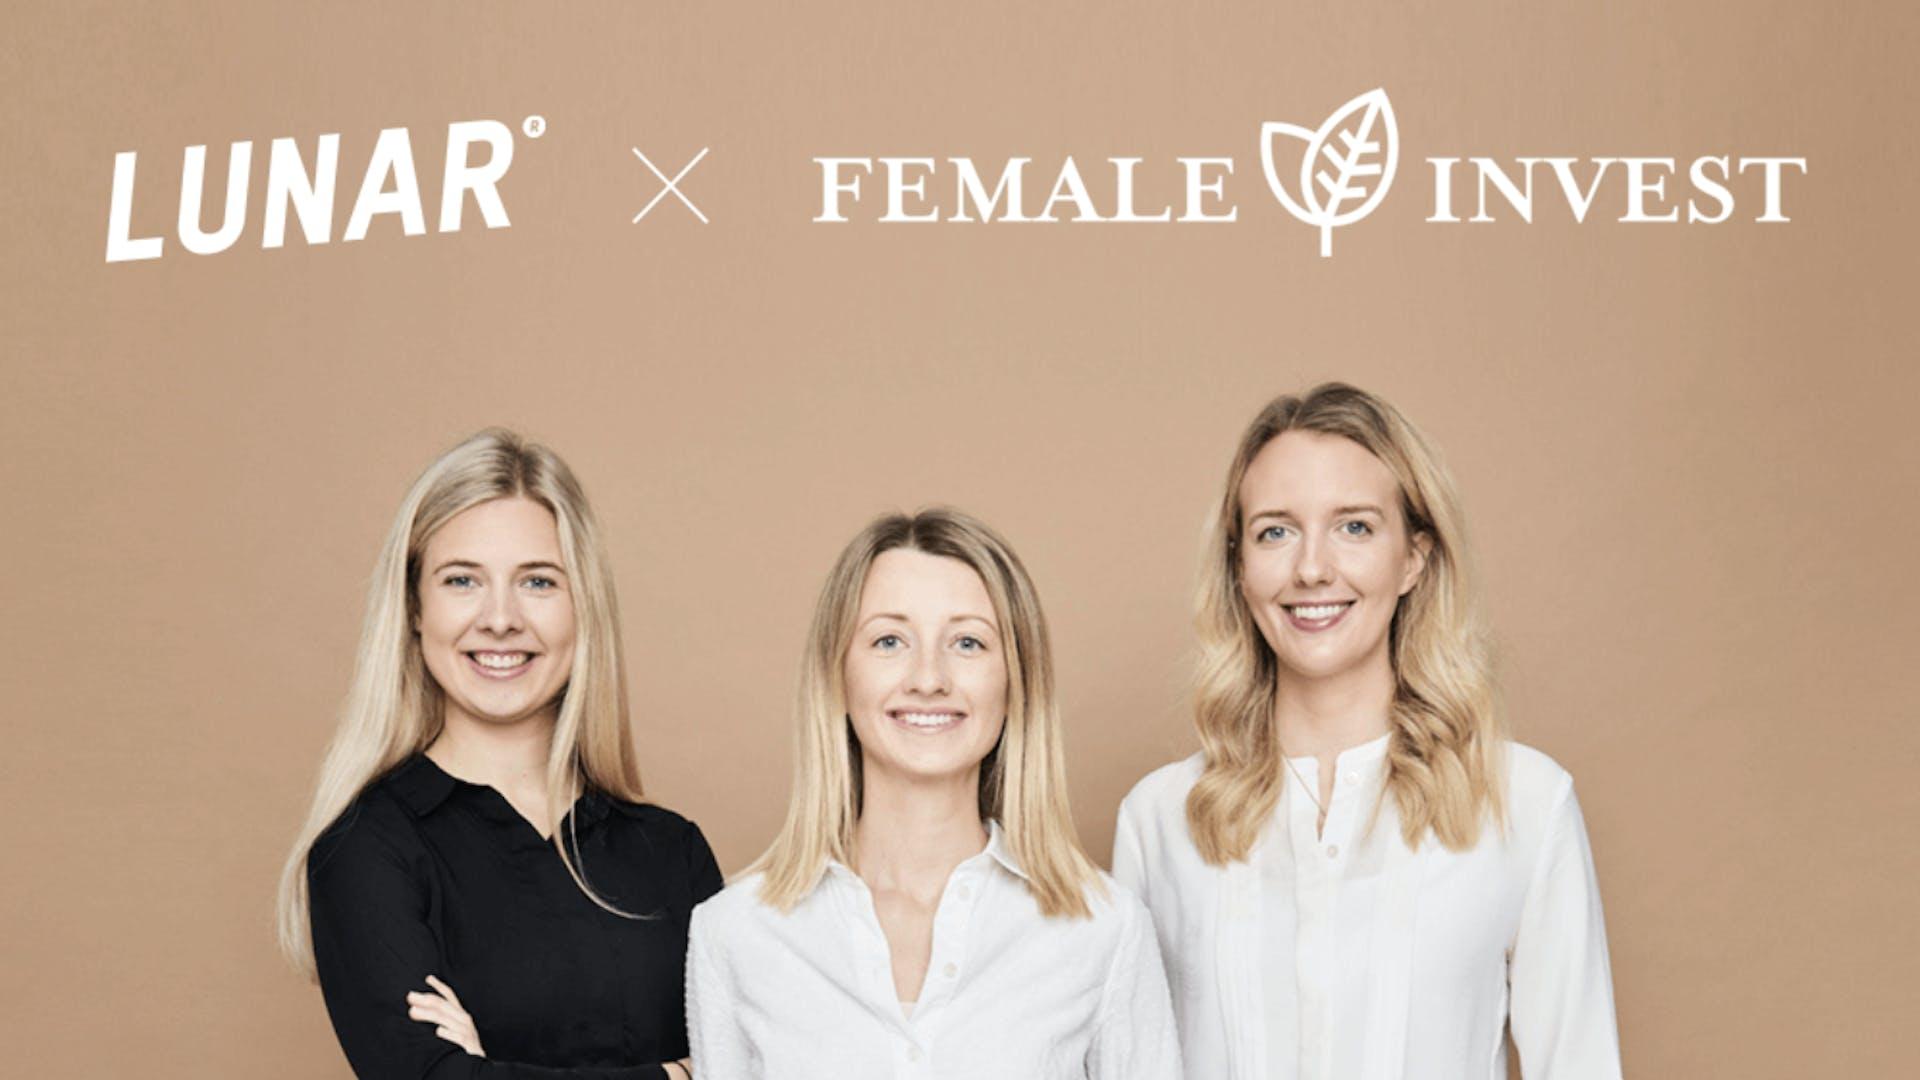 Lunar x Female Invest